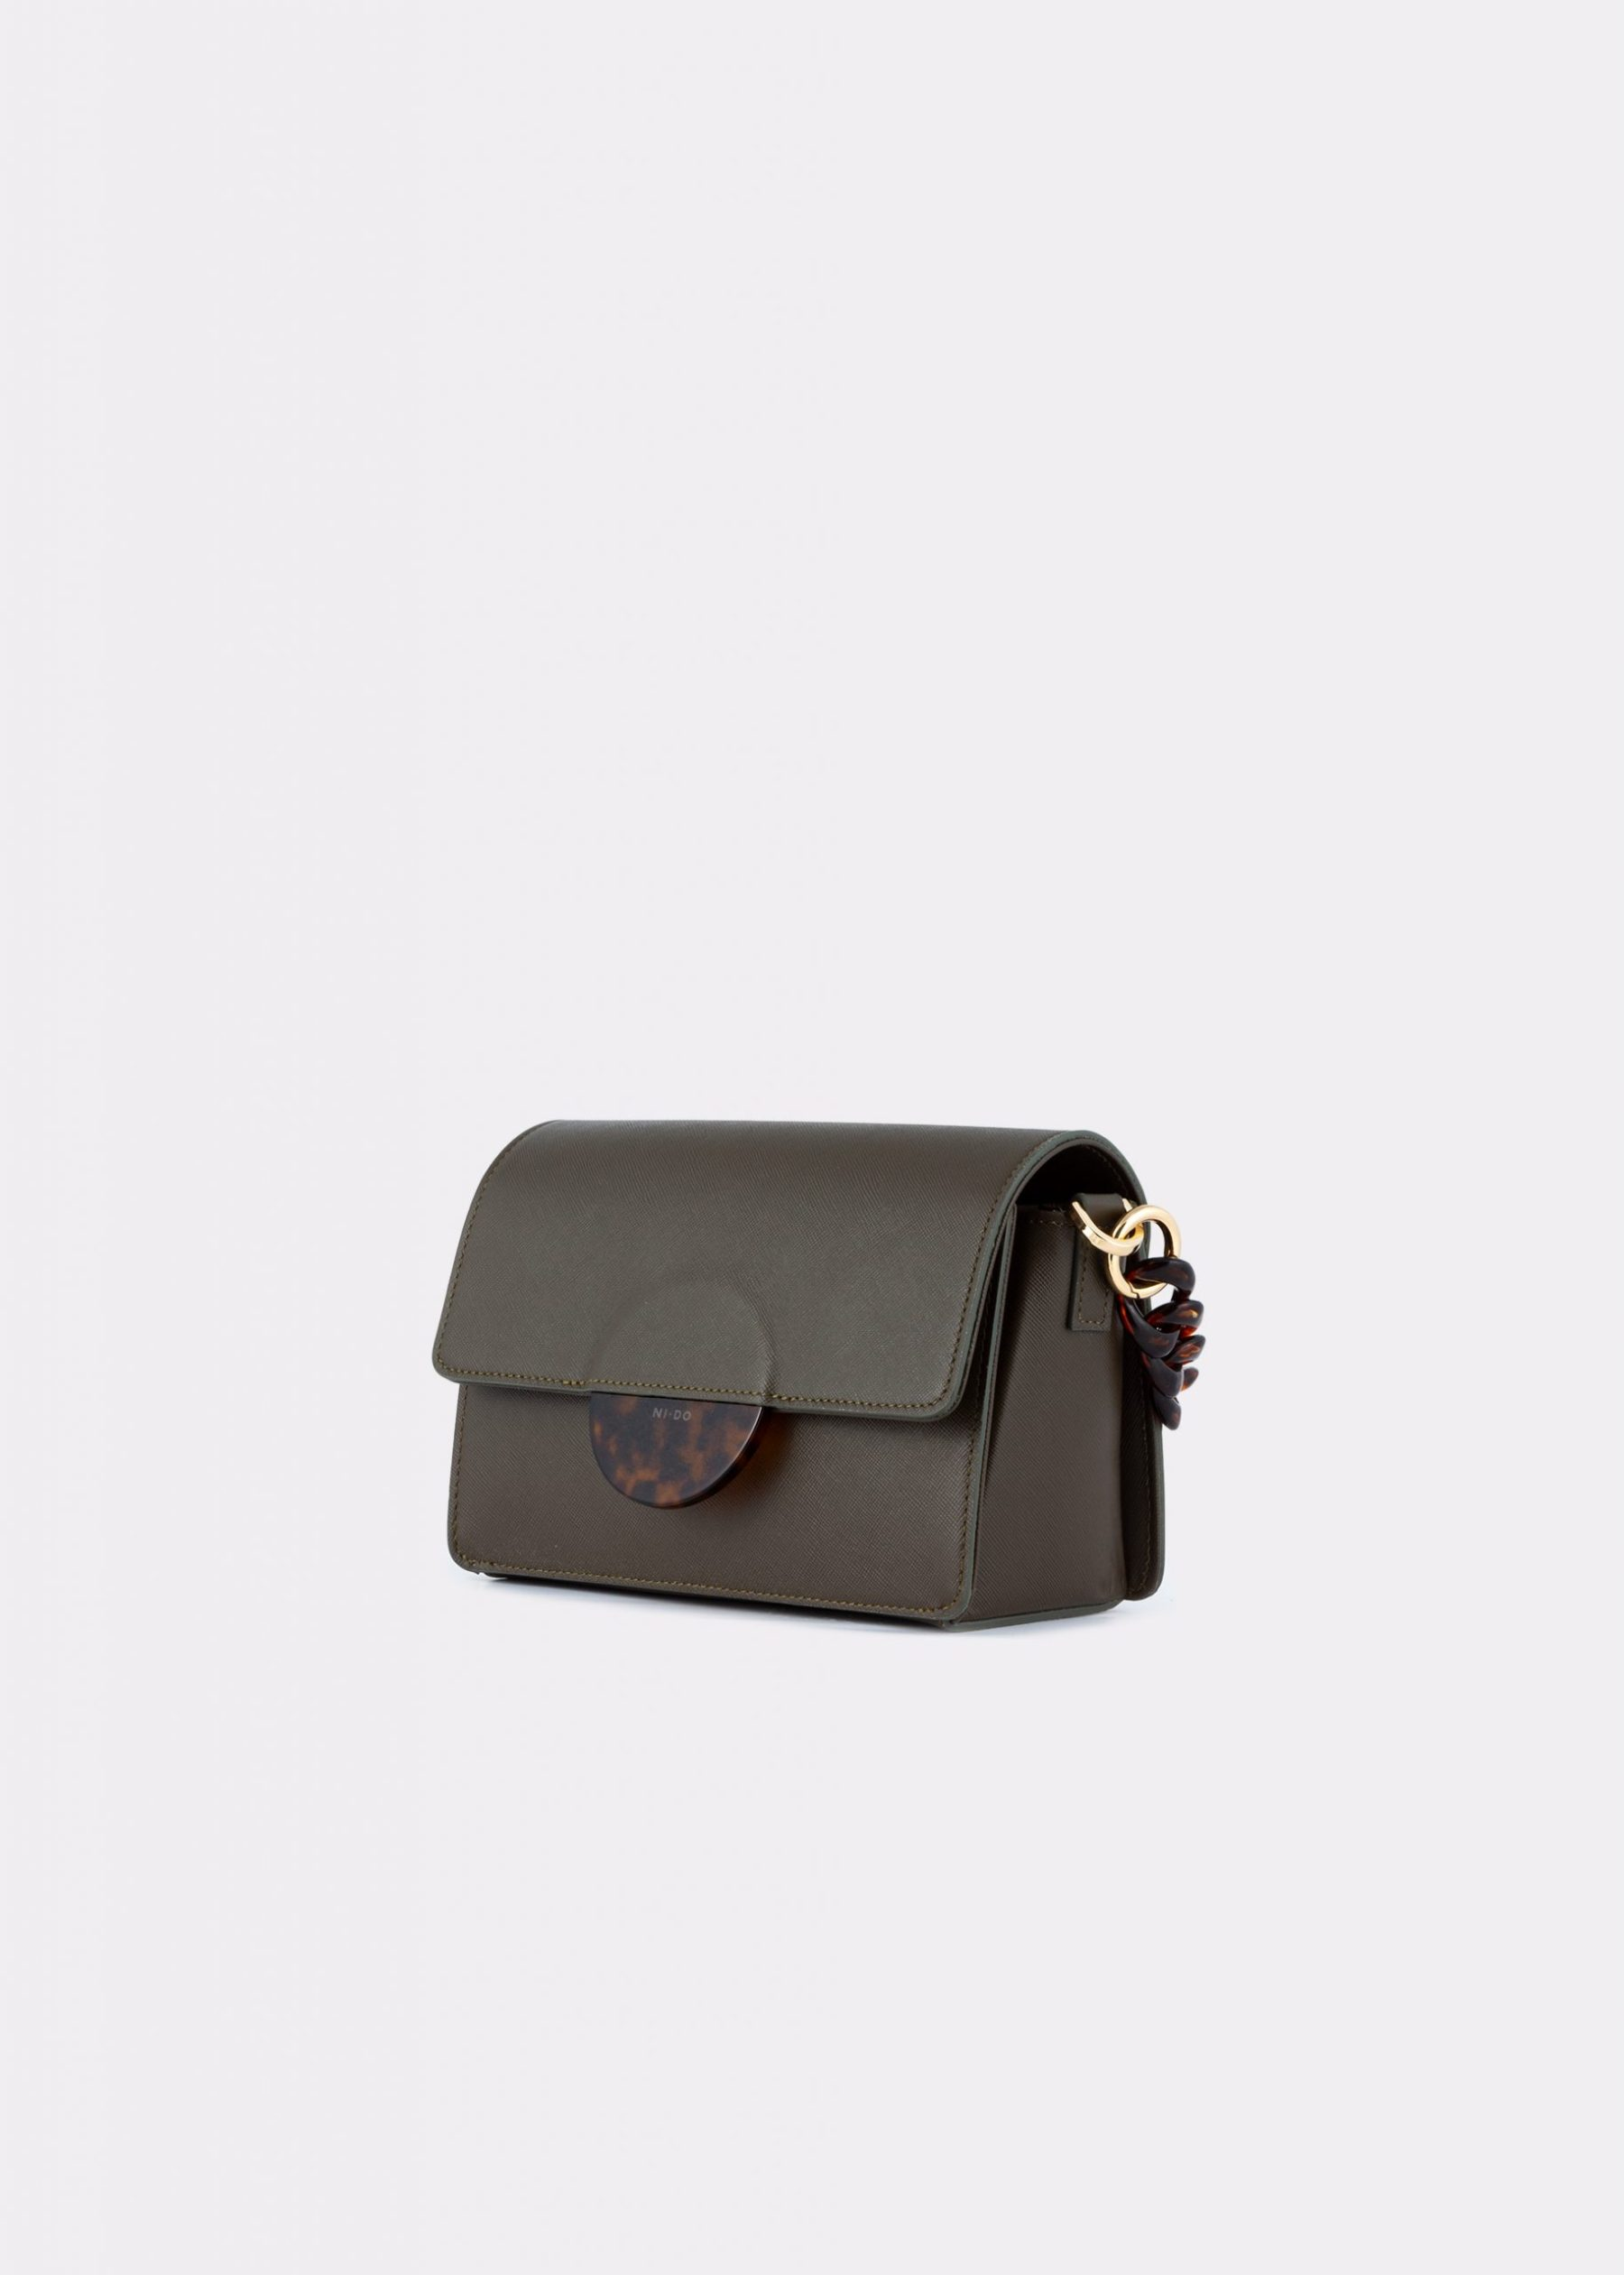 NIDO Cuore_Mini bag Olivegreen_side view